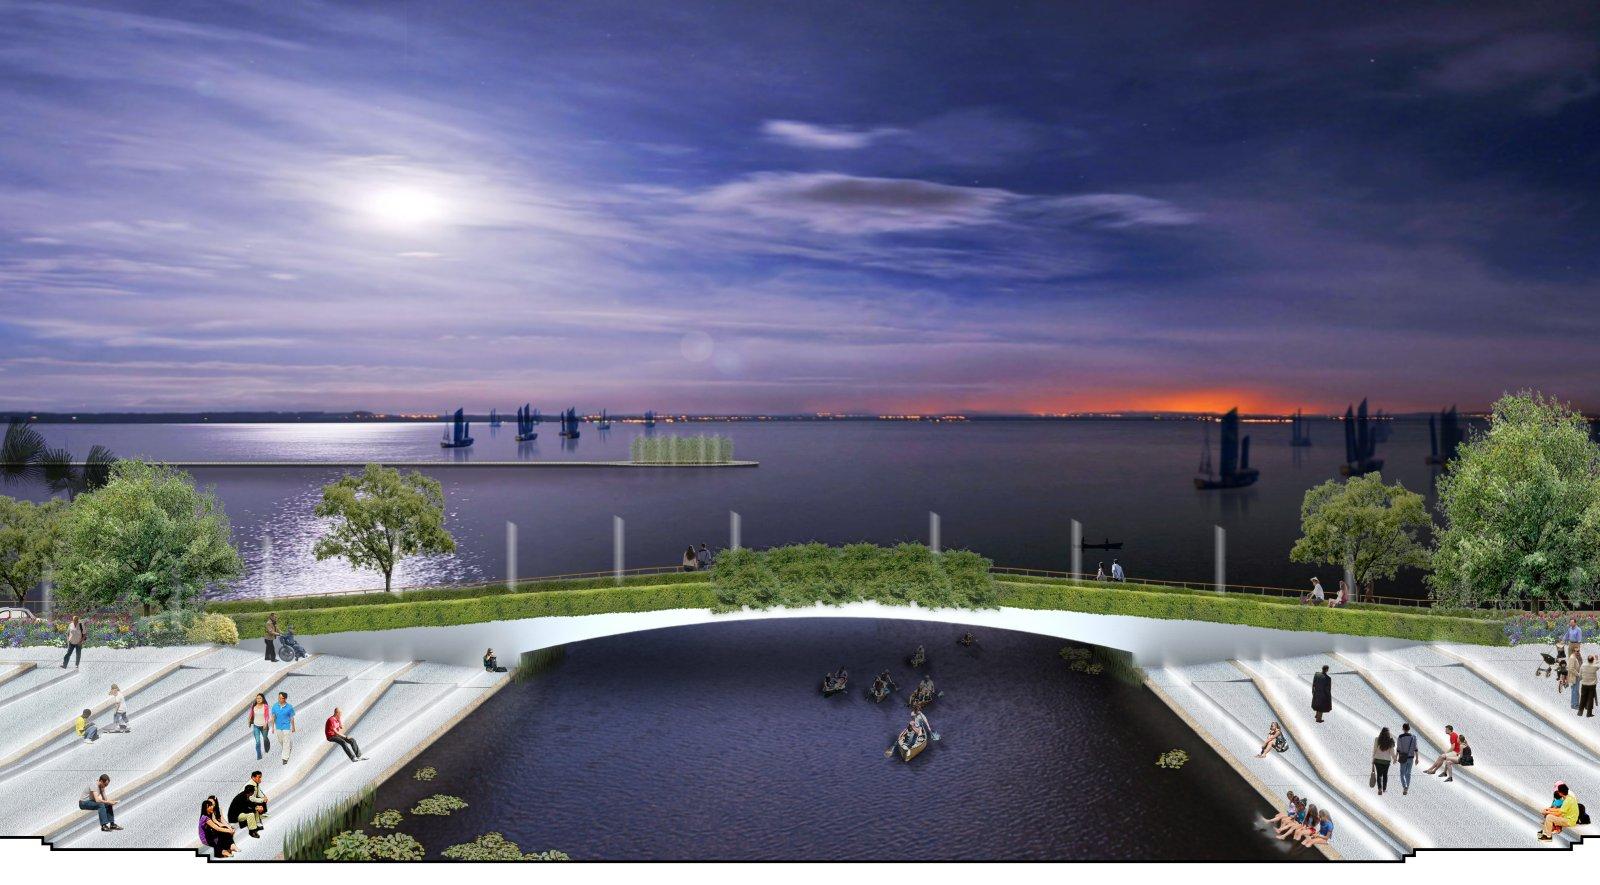 Wujiang East Lake Tai Ecological Tourism Resort